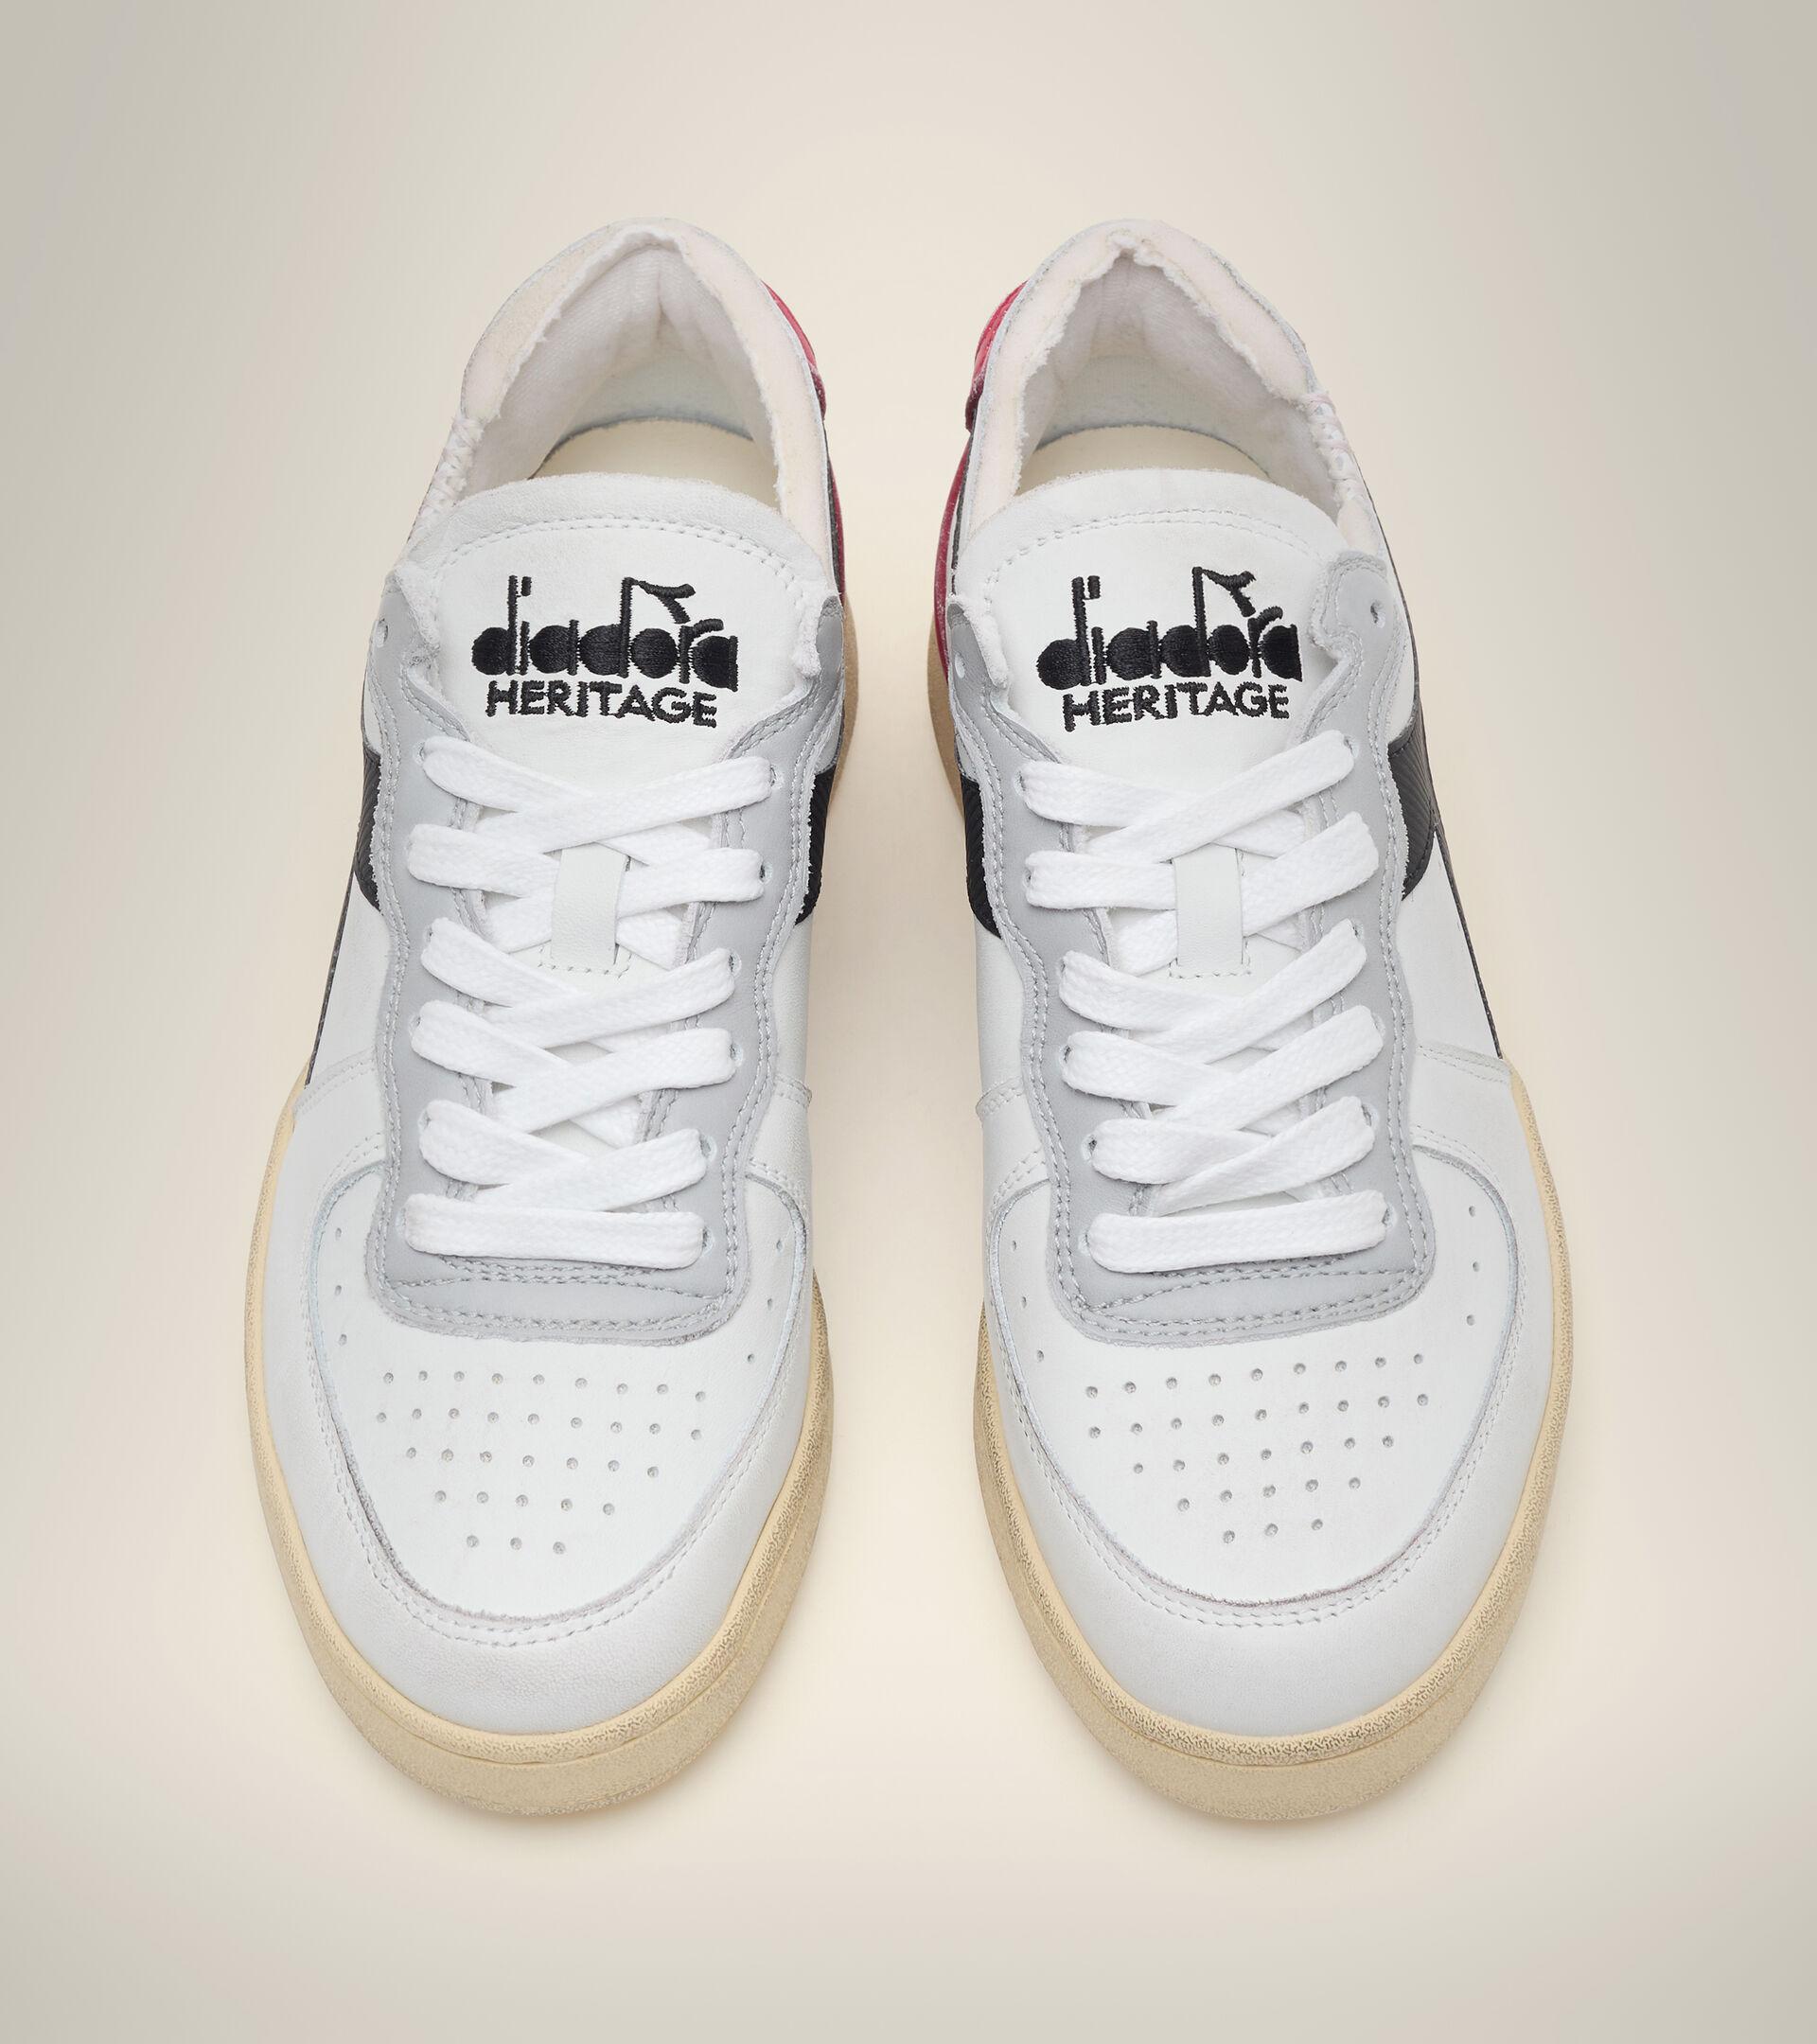 Chaussures Heritage - Unisexe MI BASKET ROW CUT BLANC/GRENAT/NOIR - Diadora